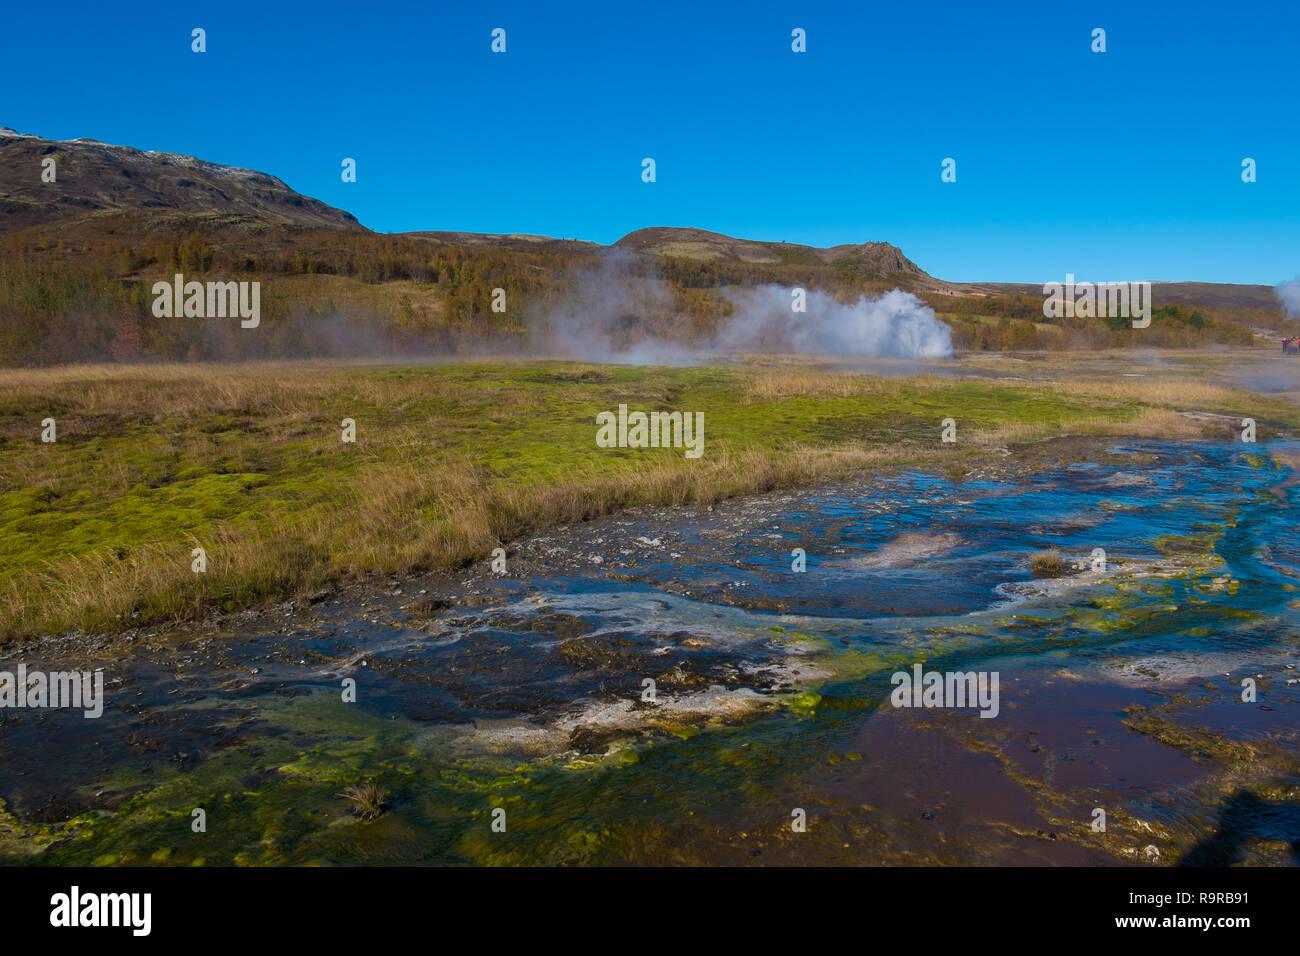 Haukadalur, the geysers, geothermal, Strokkur, hot springs, mud pots and fumaroles - Stock Image